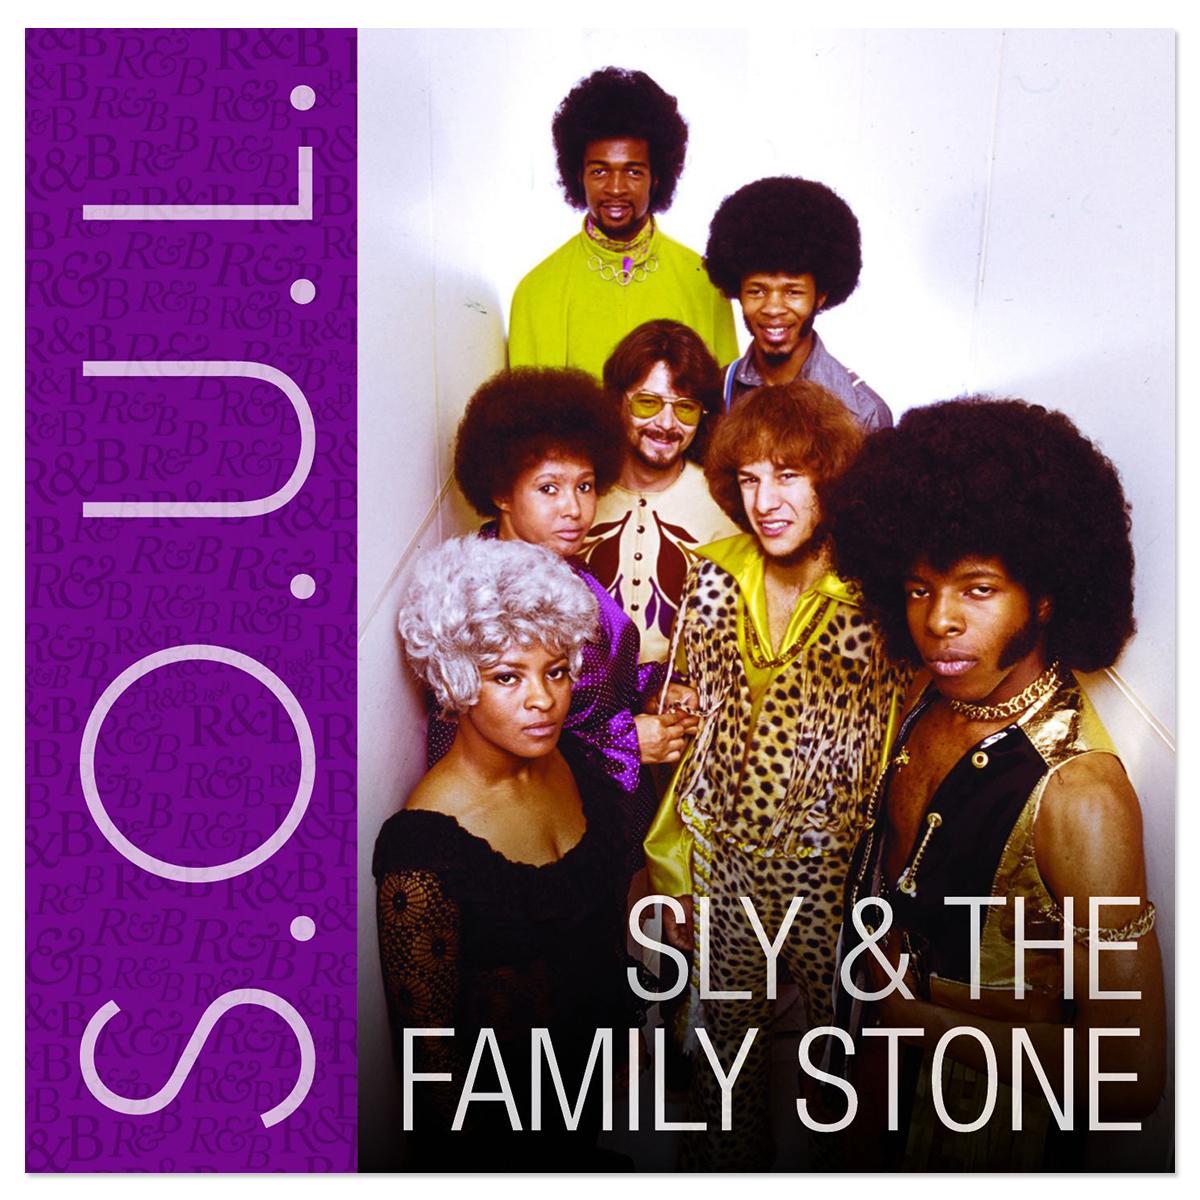 Sly & The Family Stone S.O.U.L CD